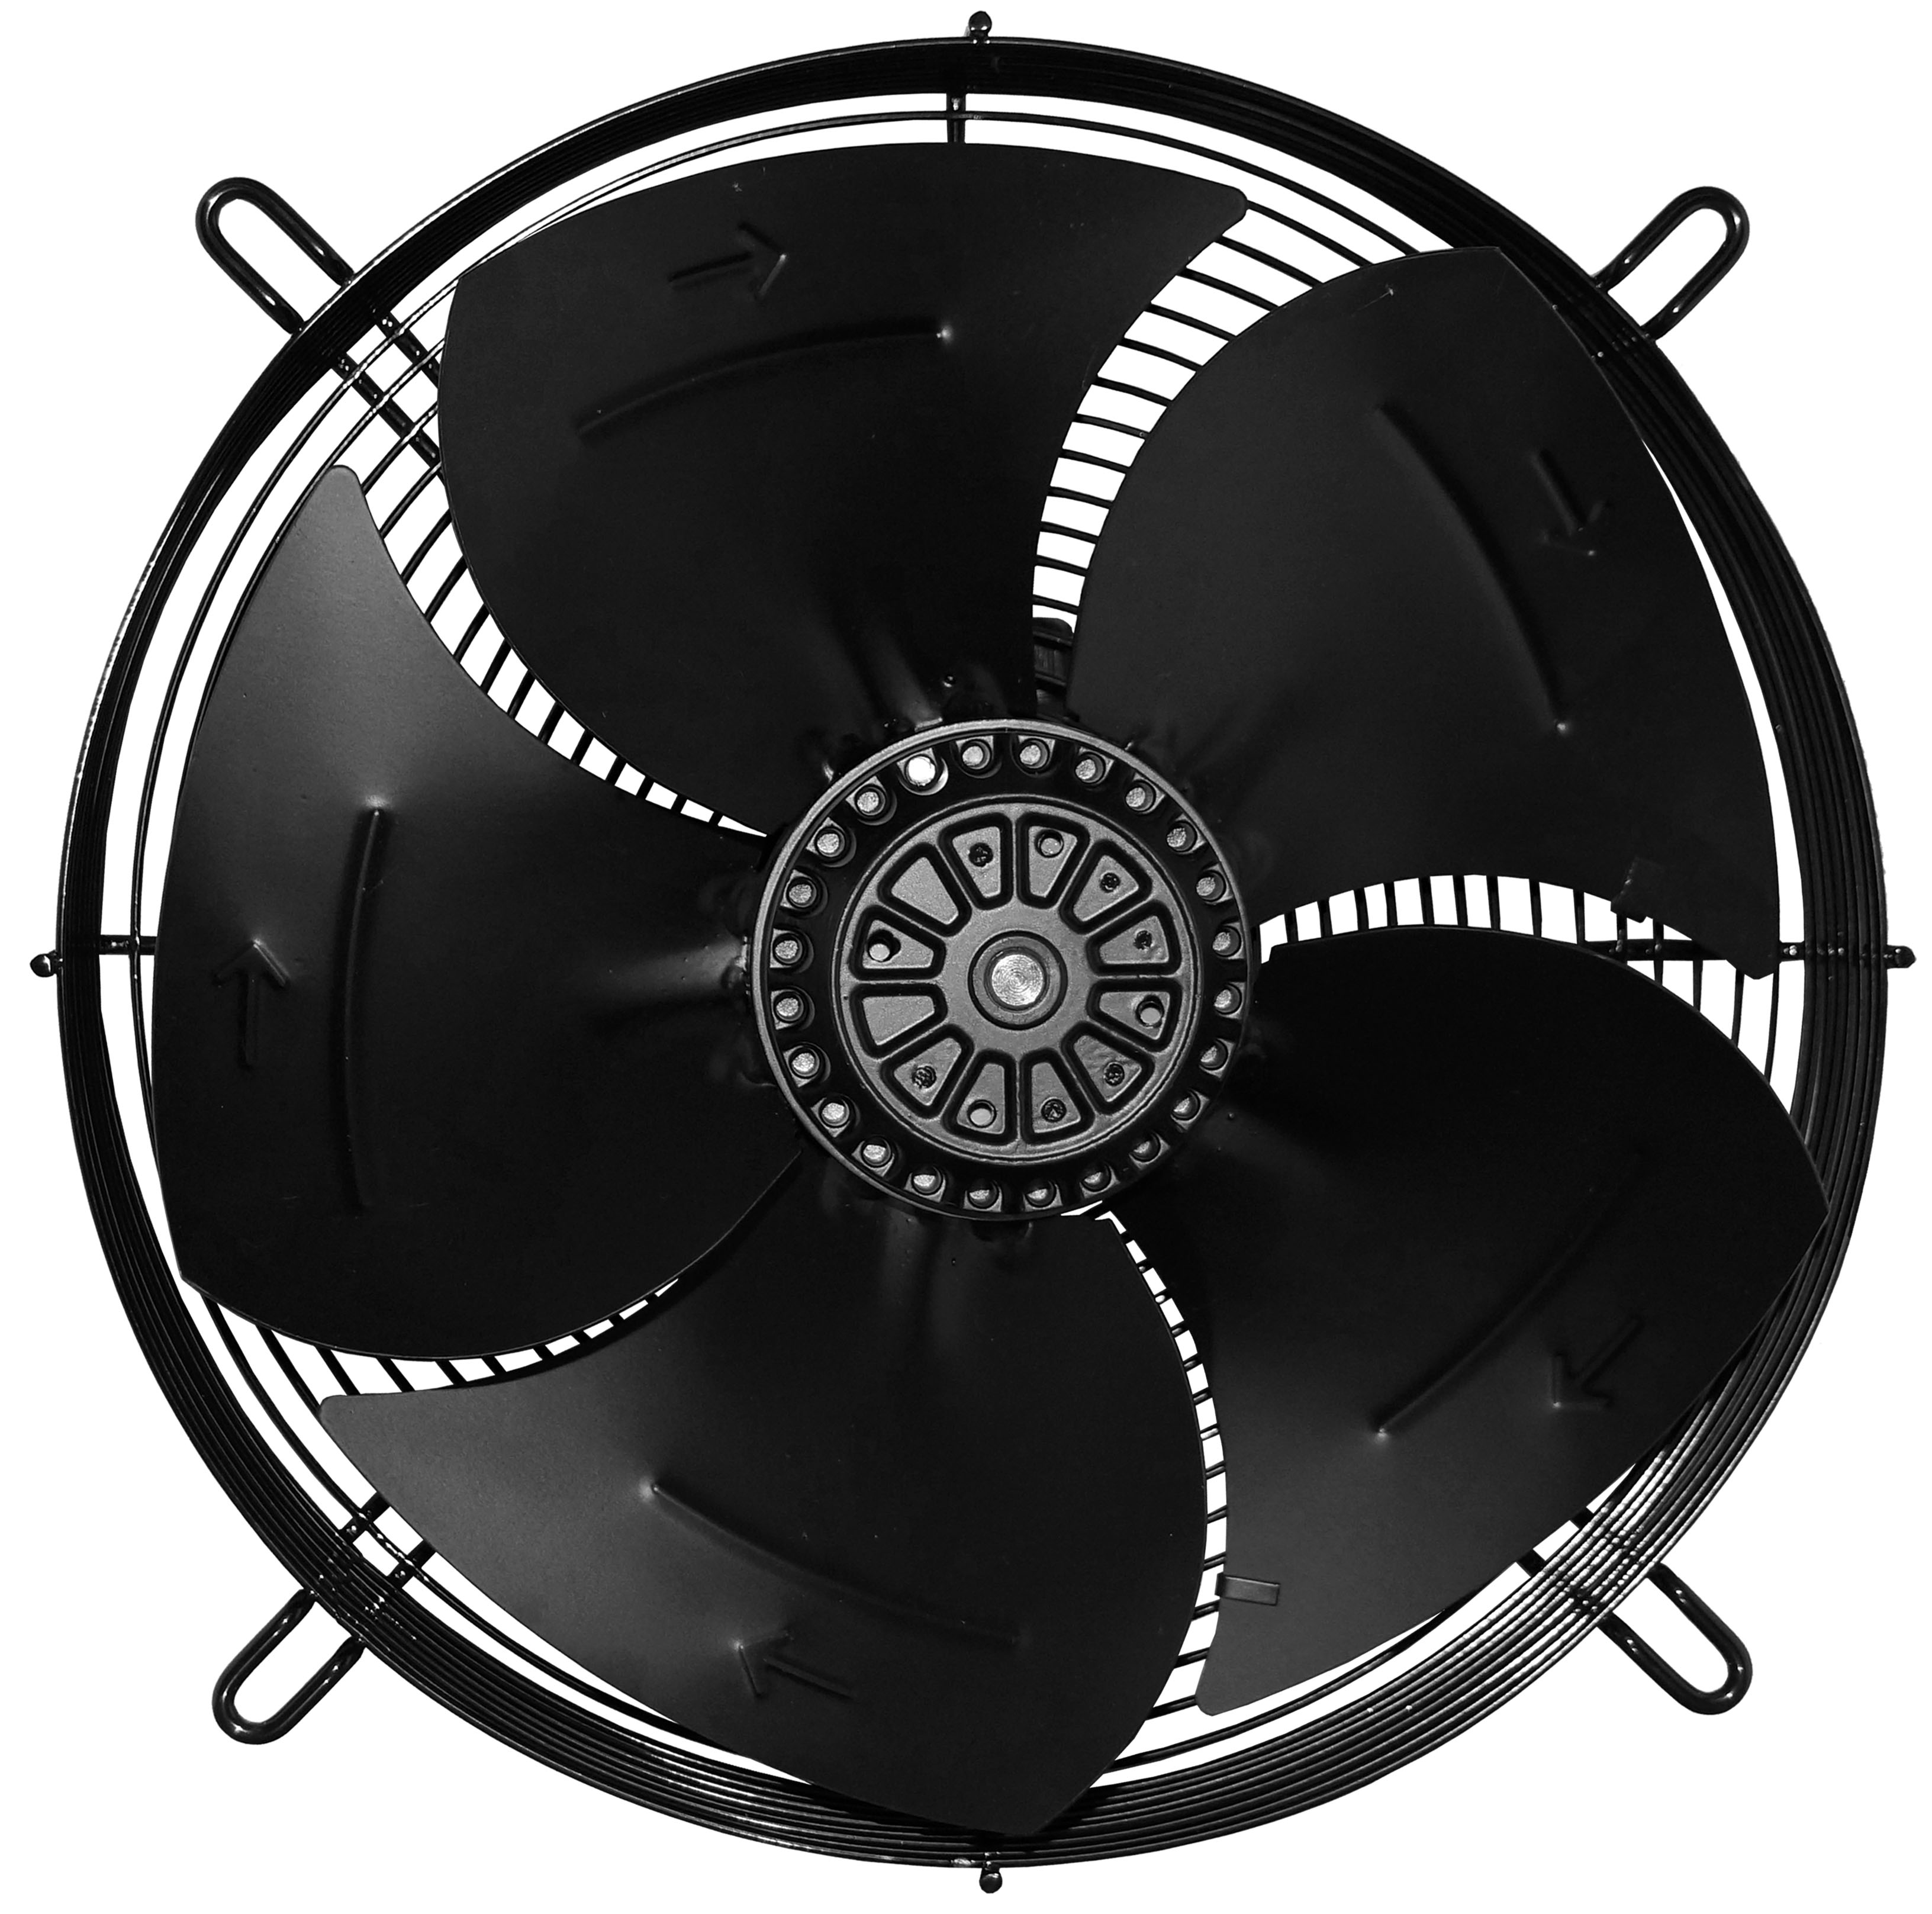 Вентилятор во 4 3